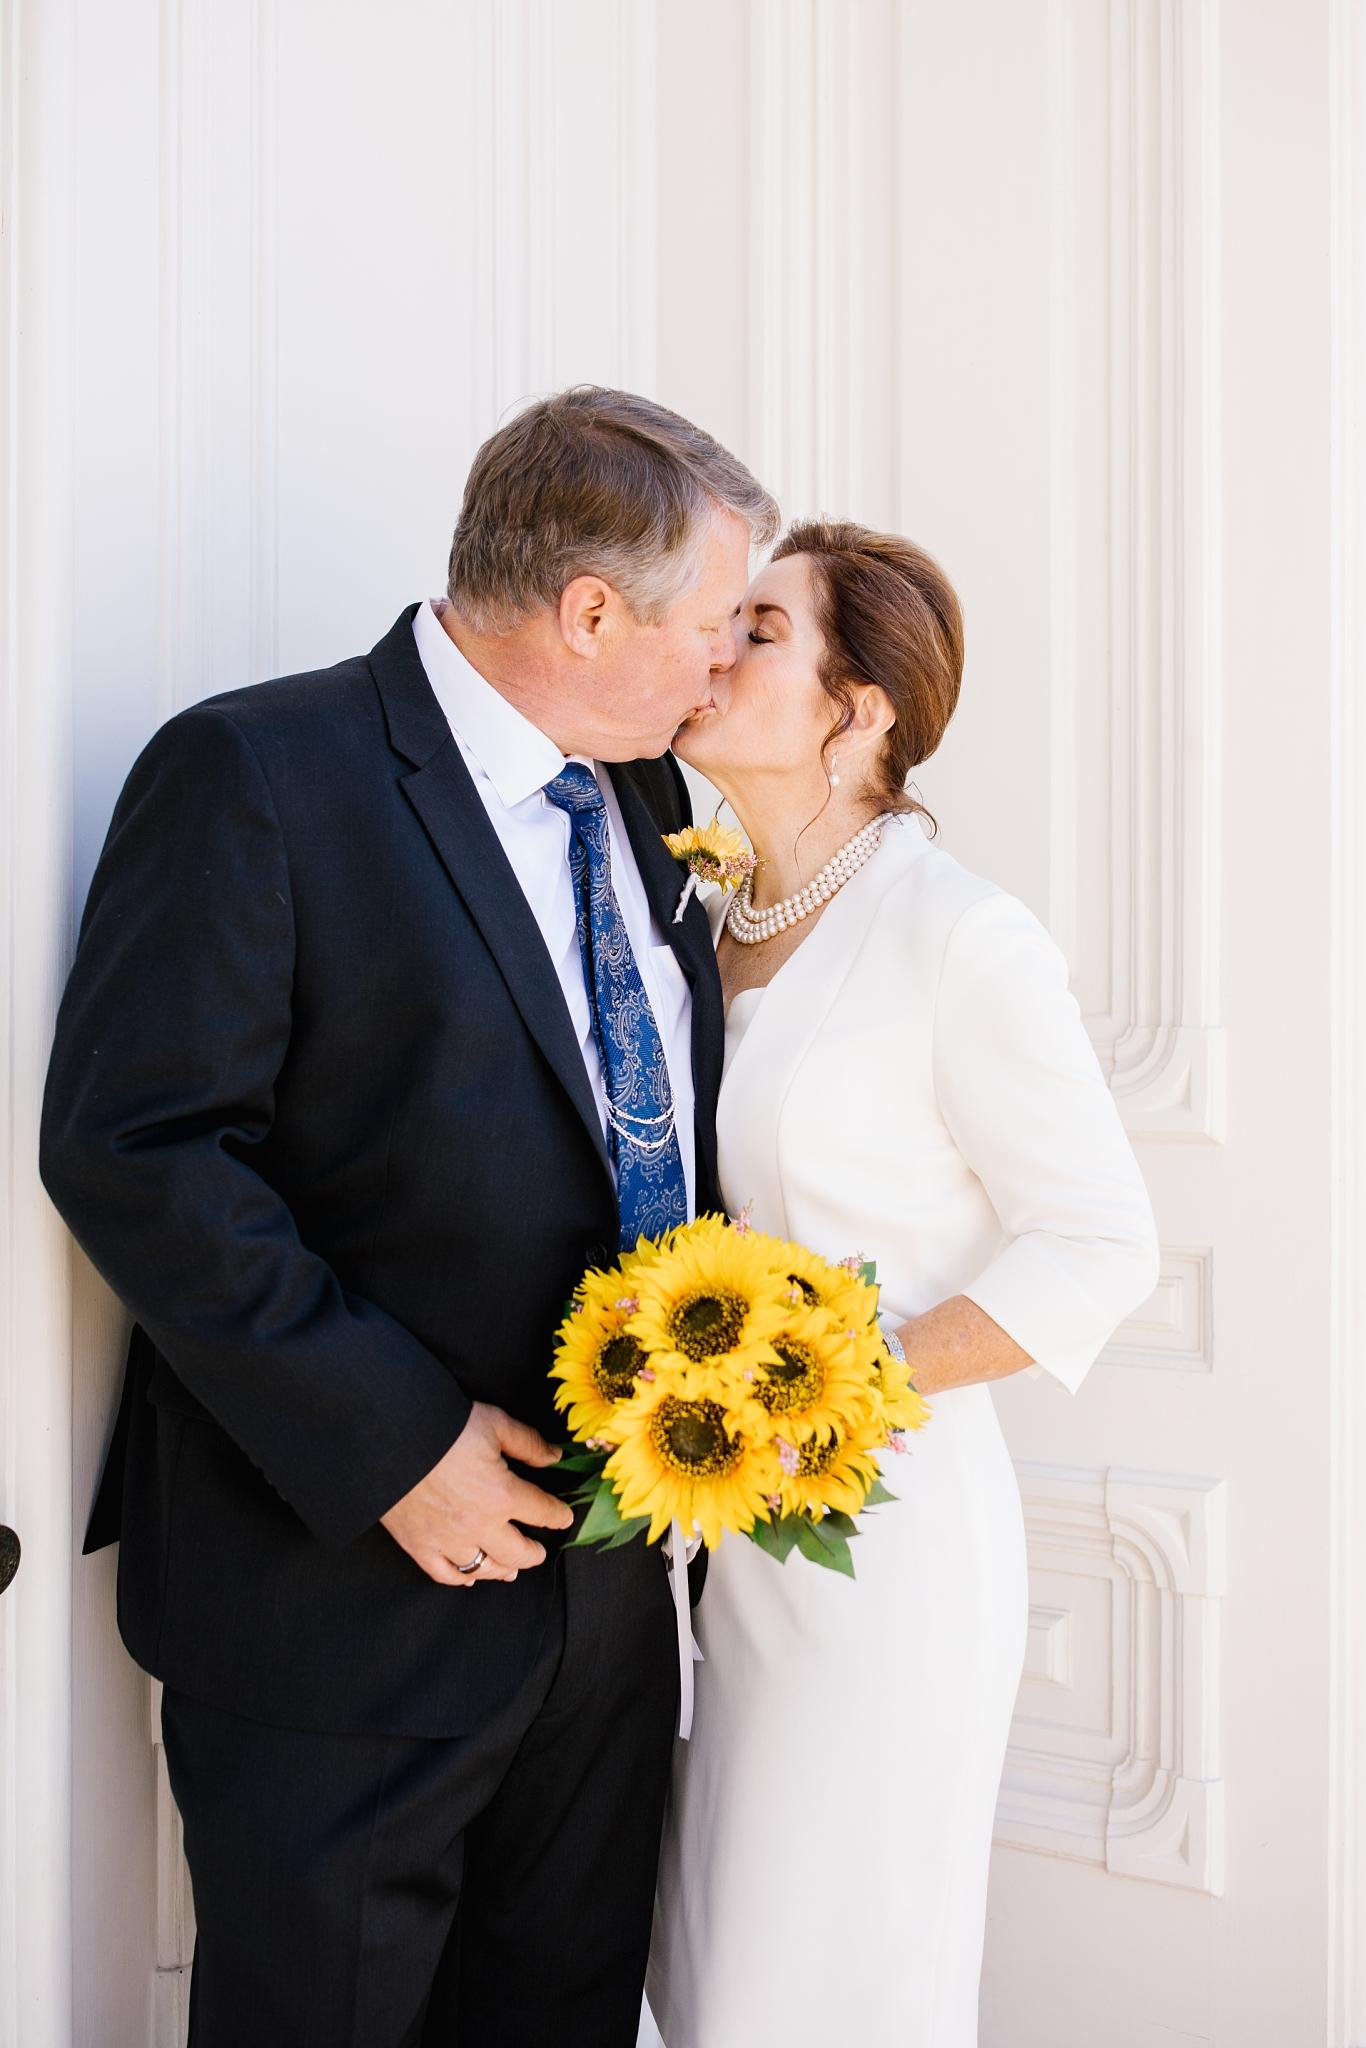 PDWeddingDay-64_Lizzie-B-Imagery-Utah-Wedding-Photographer-Park-City-Salt-Lake-City-Manti-Utah-Temple.jpg